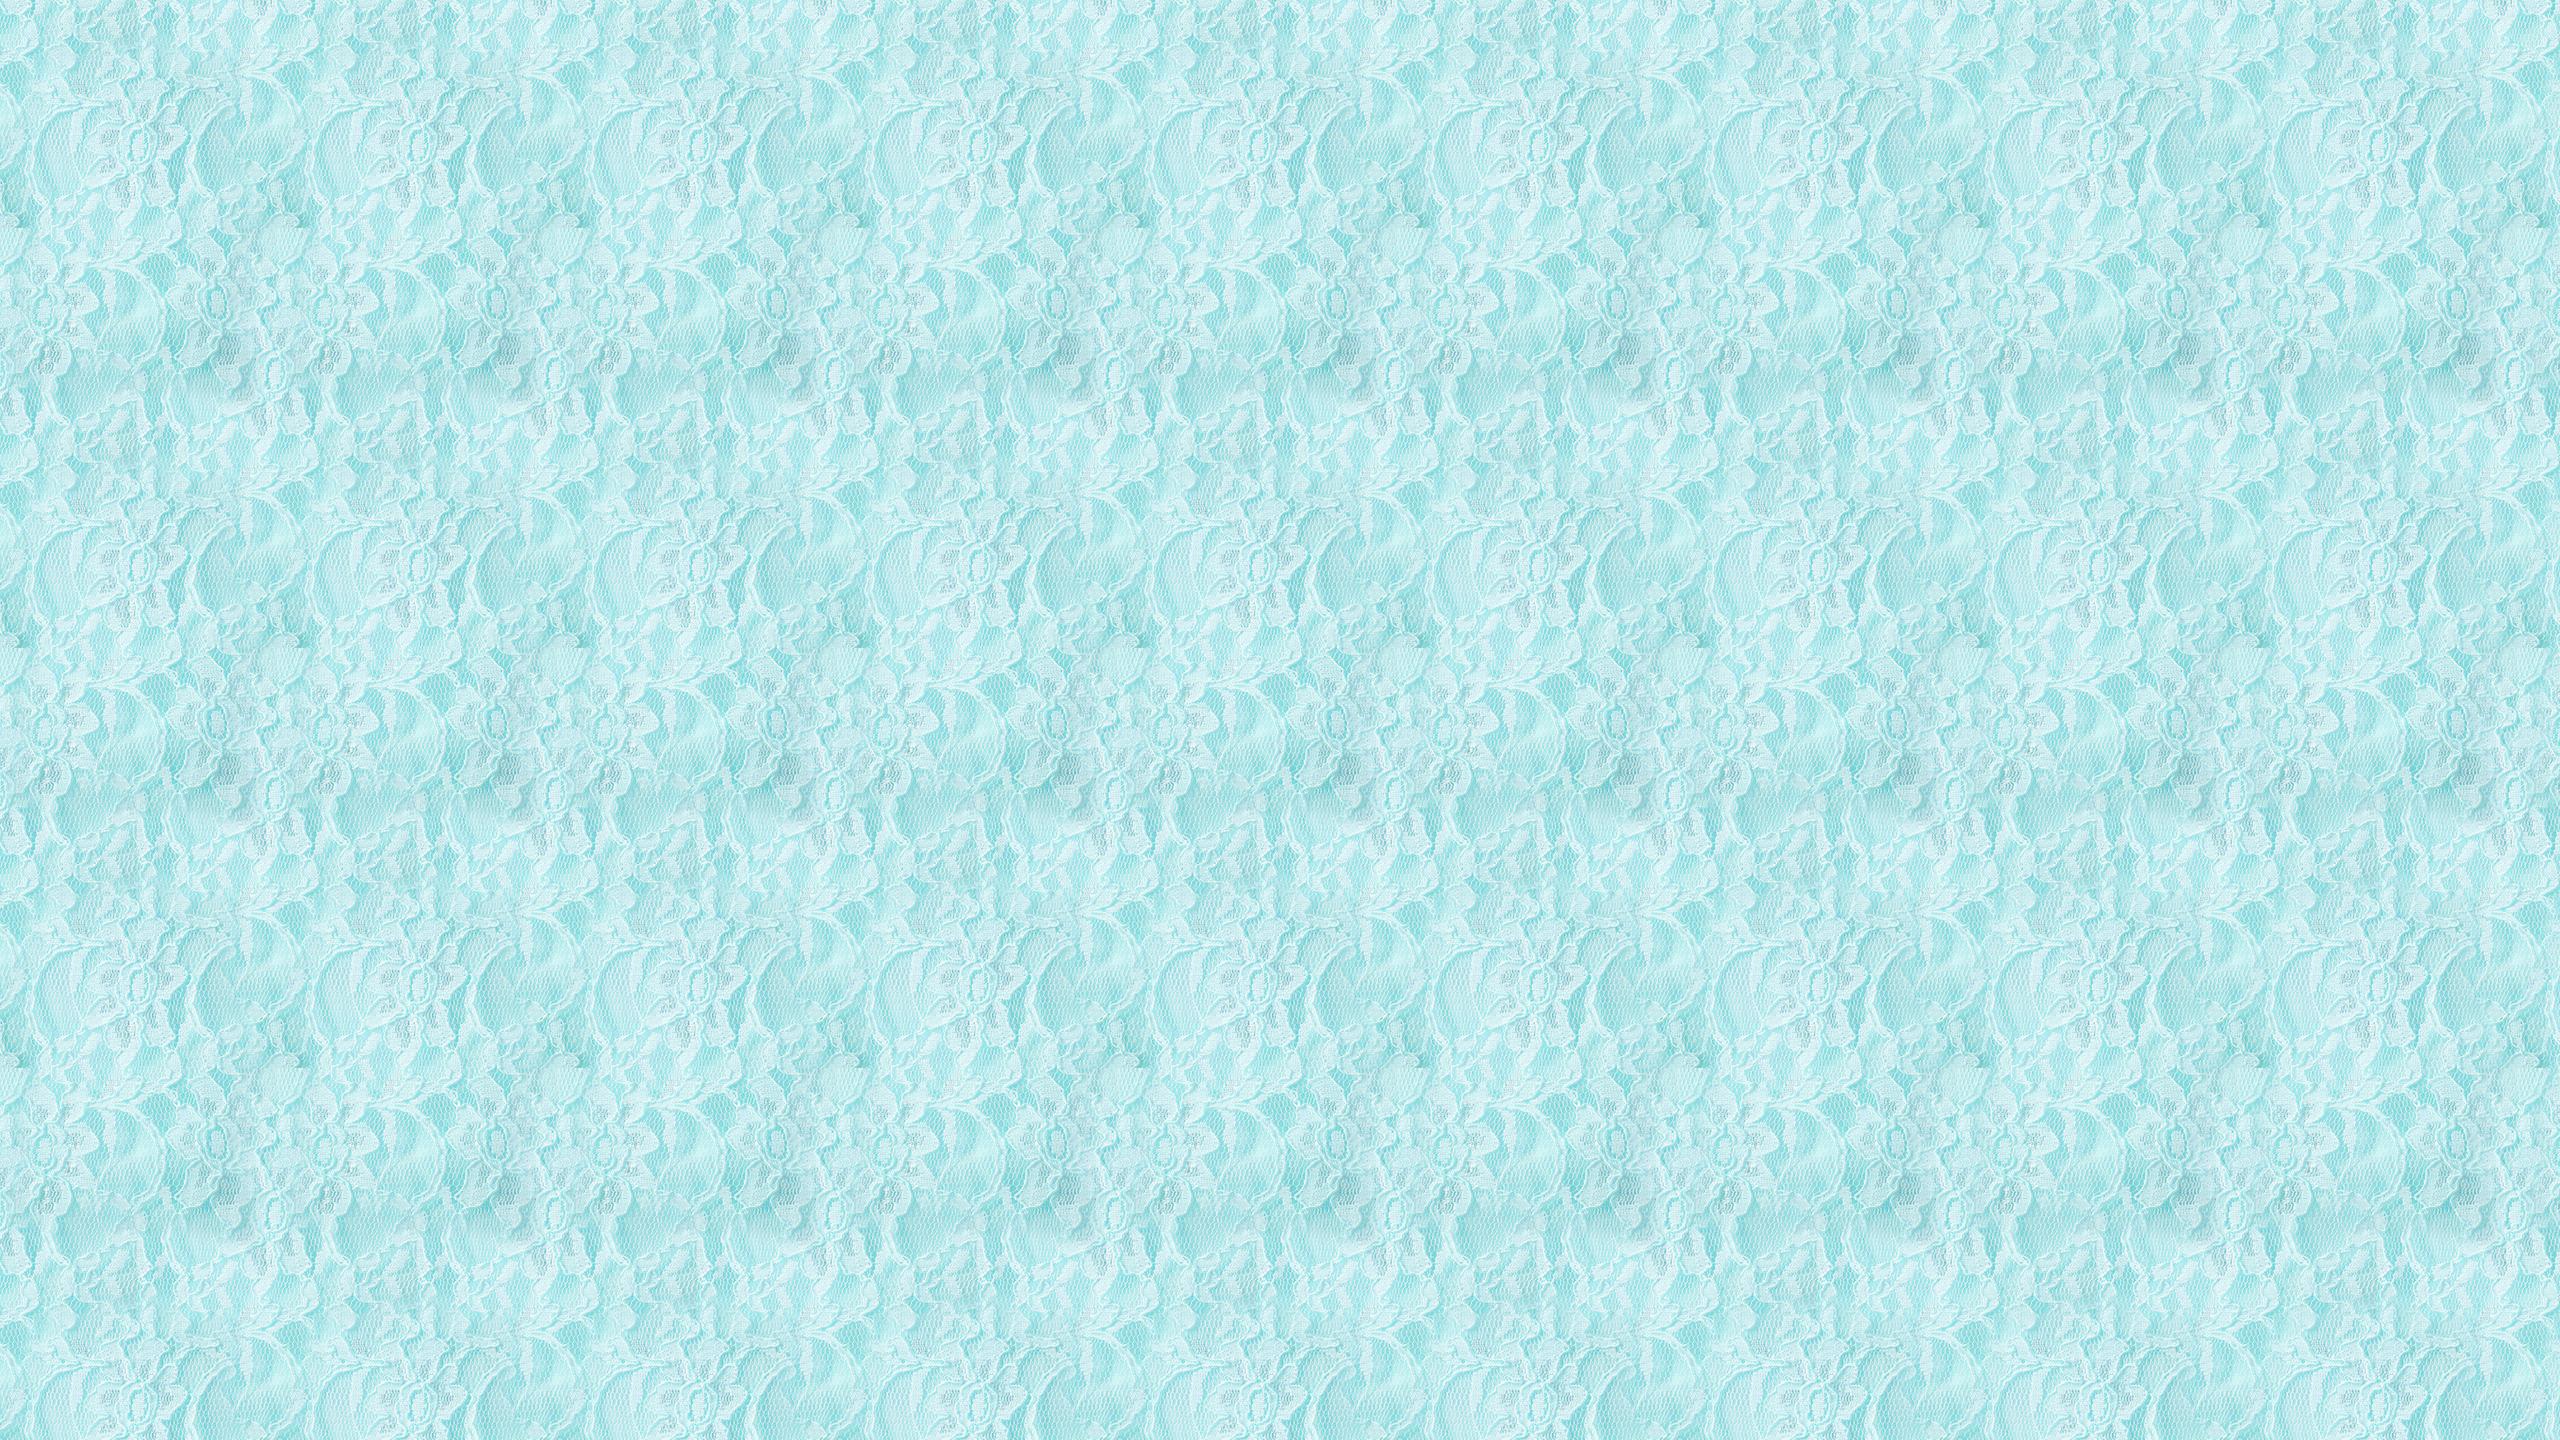 Lace desktop wallpaper